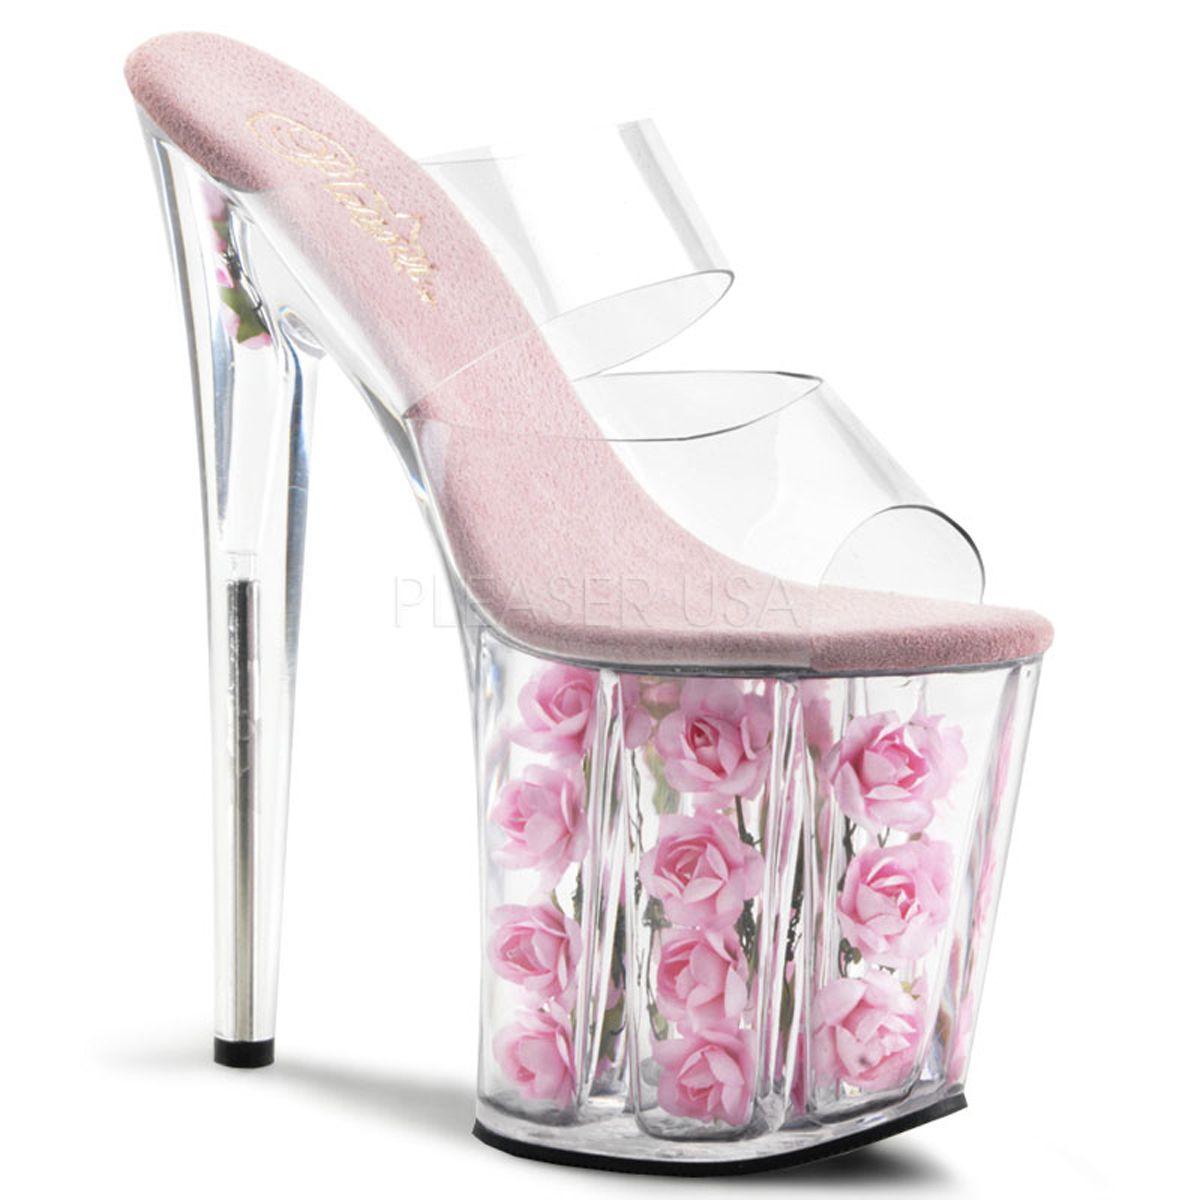 Flamingo 802fl by pink Pleaser USA   pink by rose platform heels   Pole 4601b8